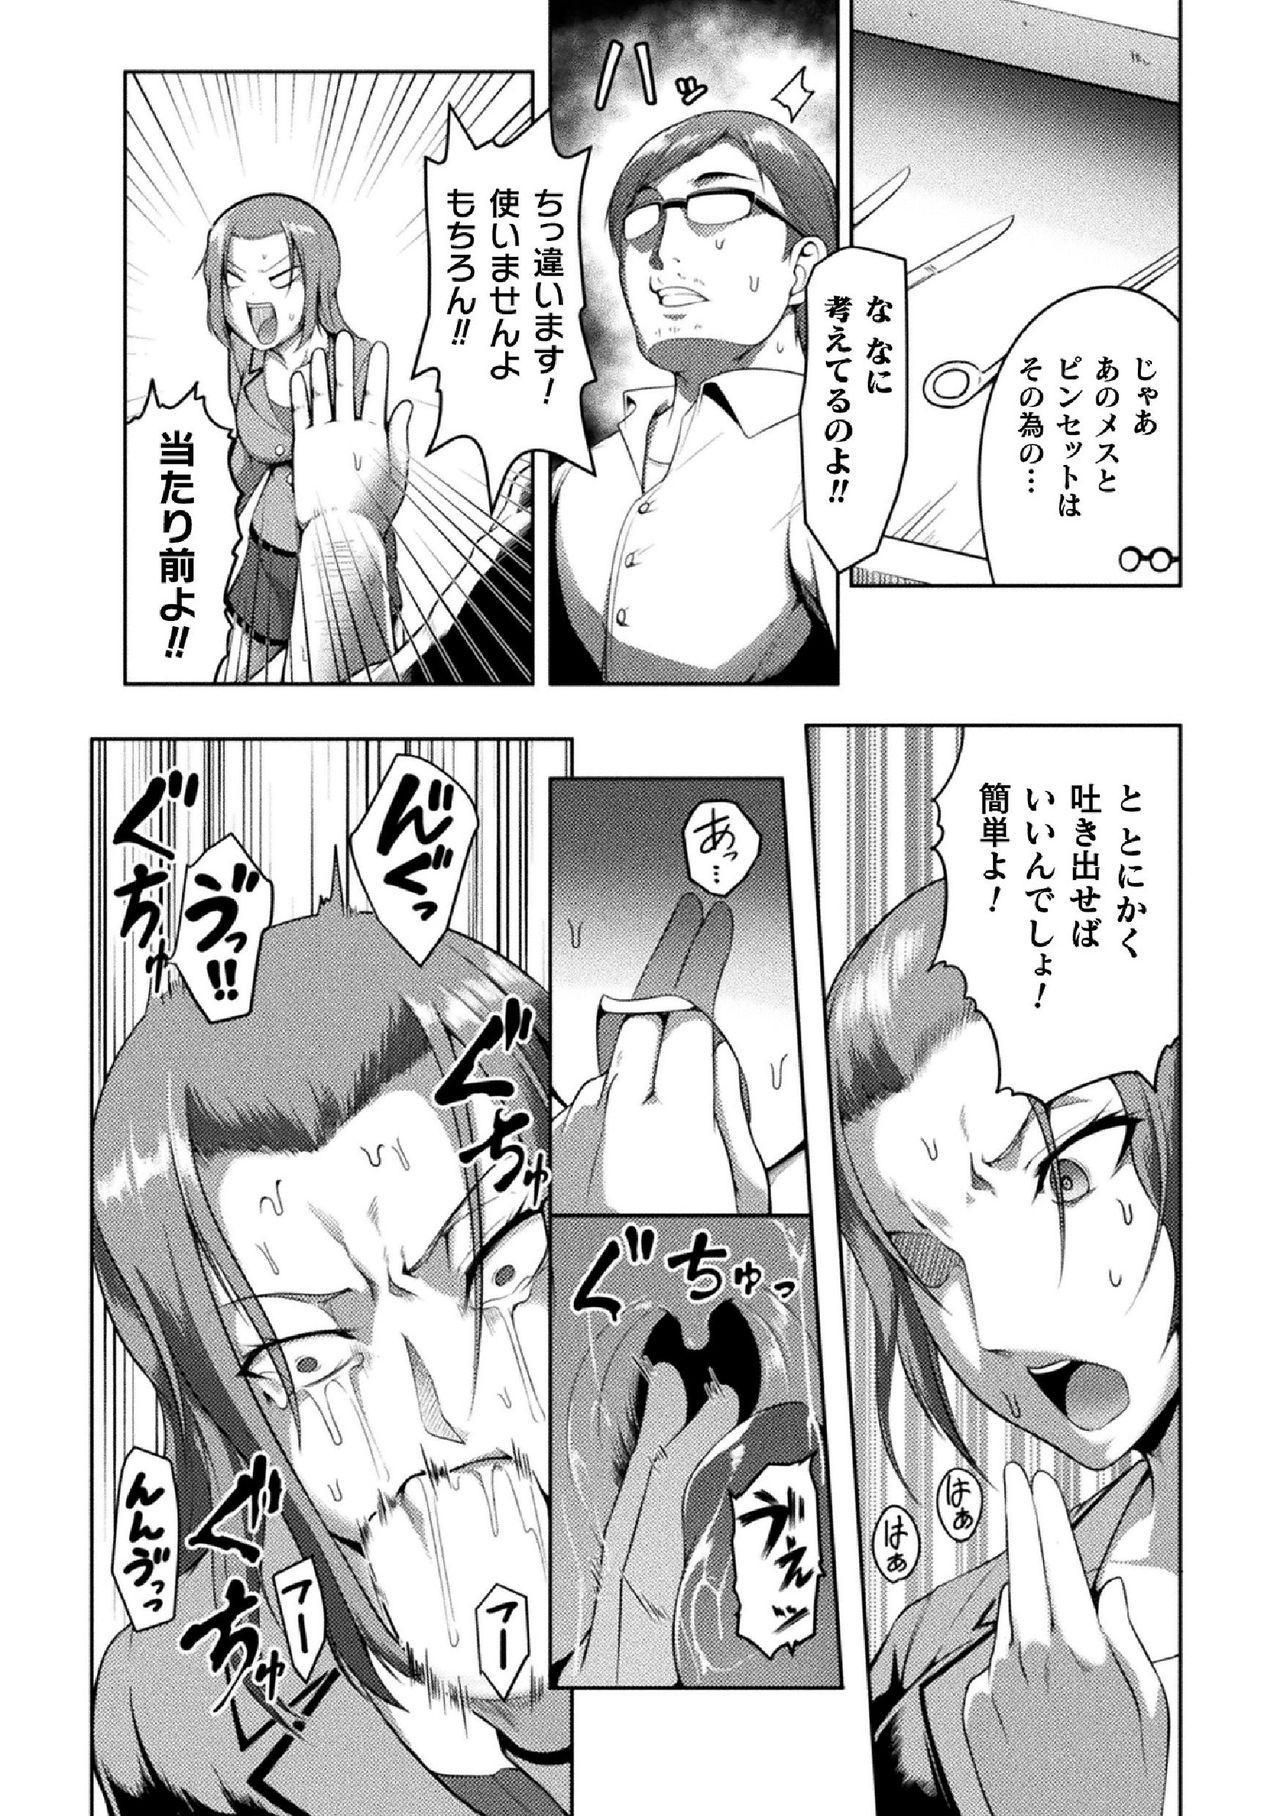 2D Comic Magazine Namaiki Onna ni HaraPun Seisai! Vol. 2 53